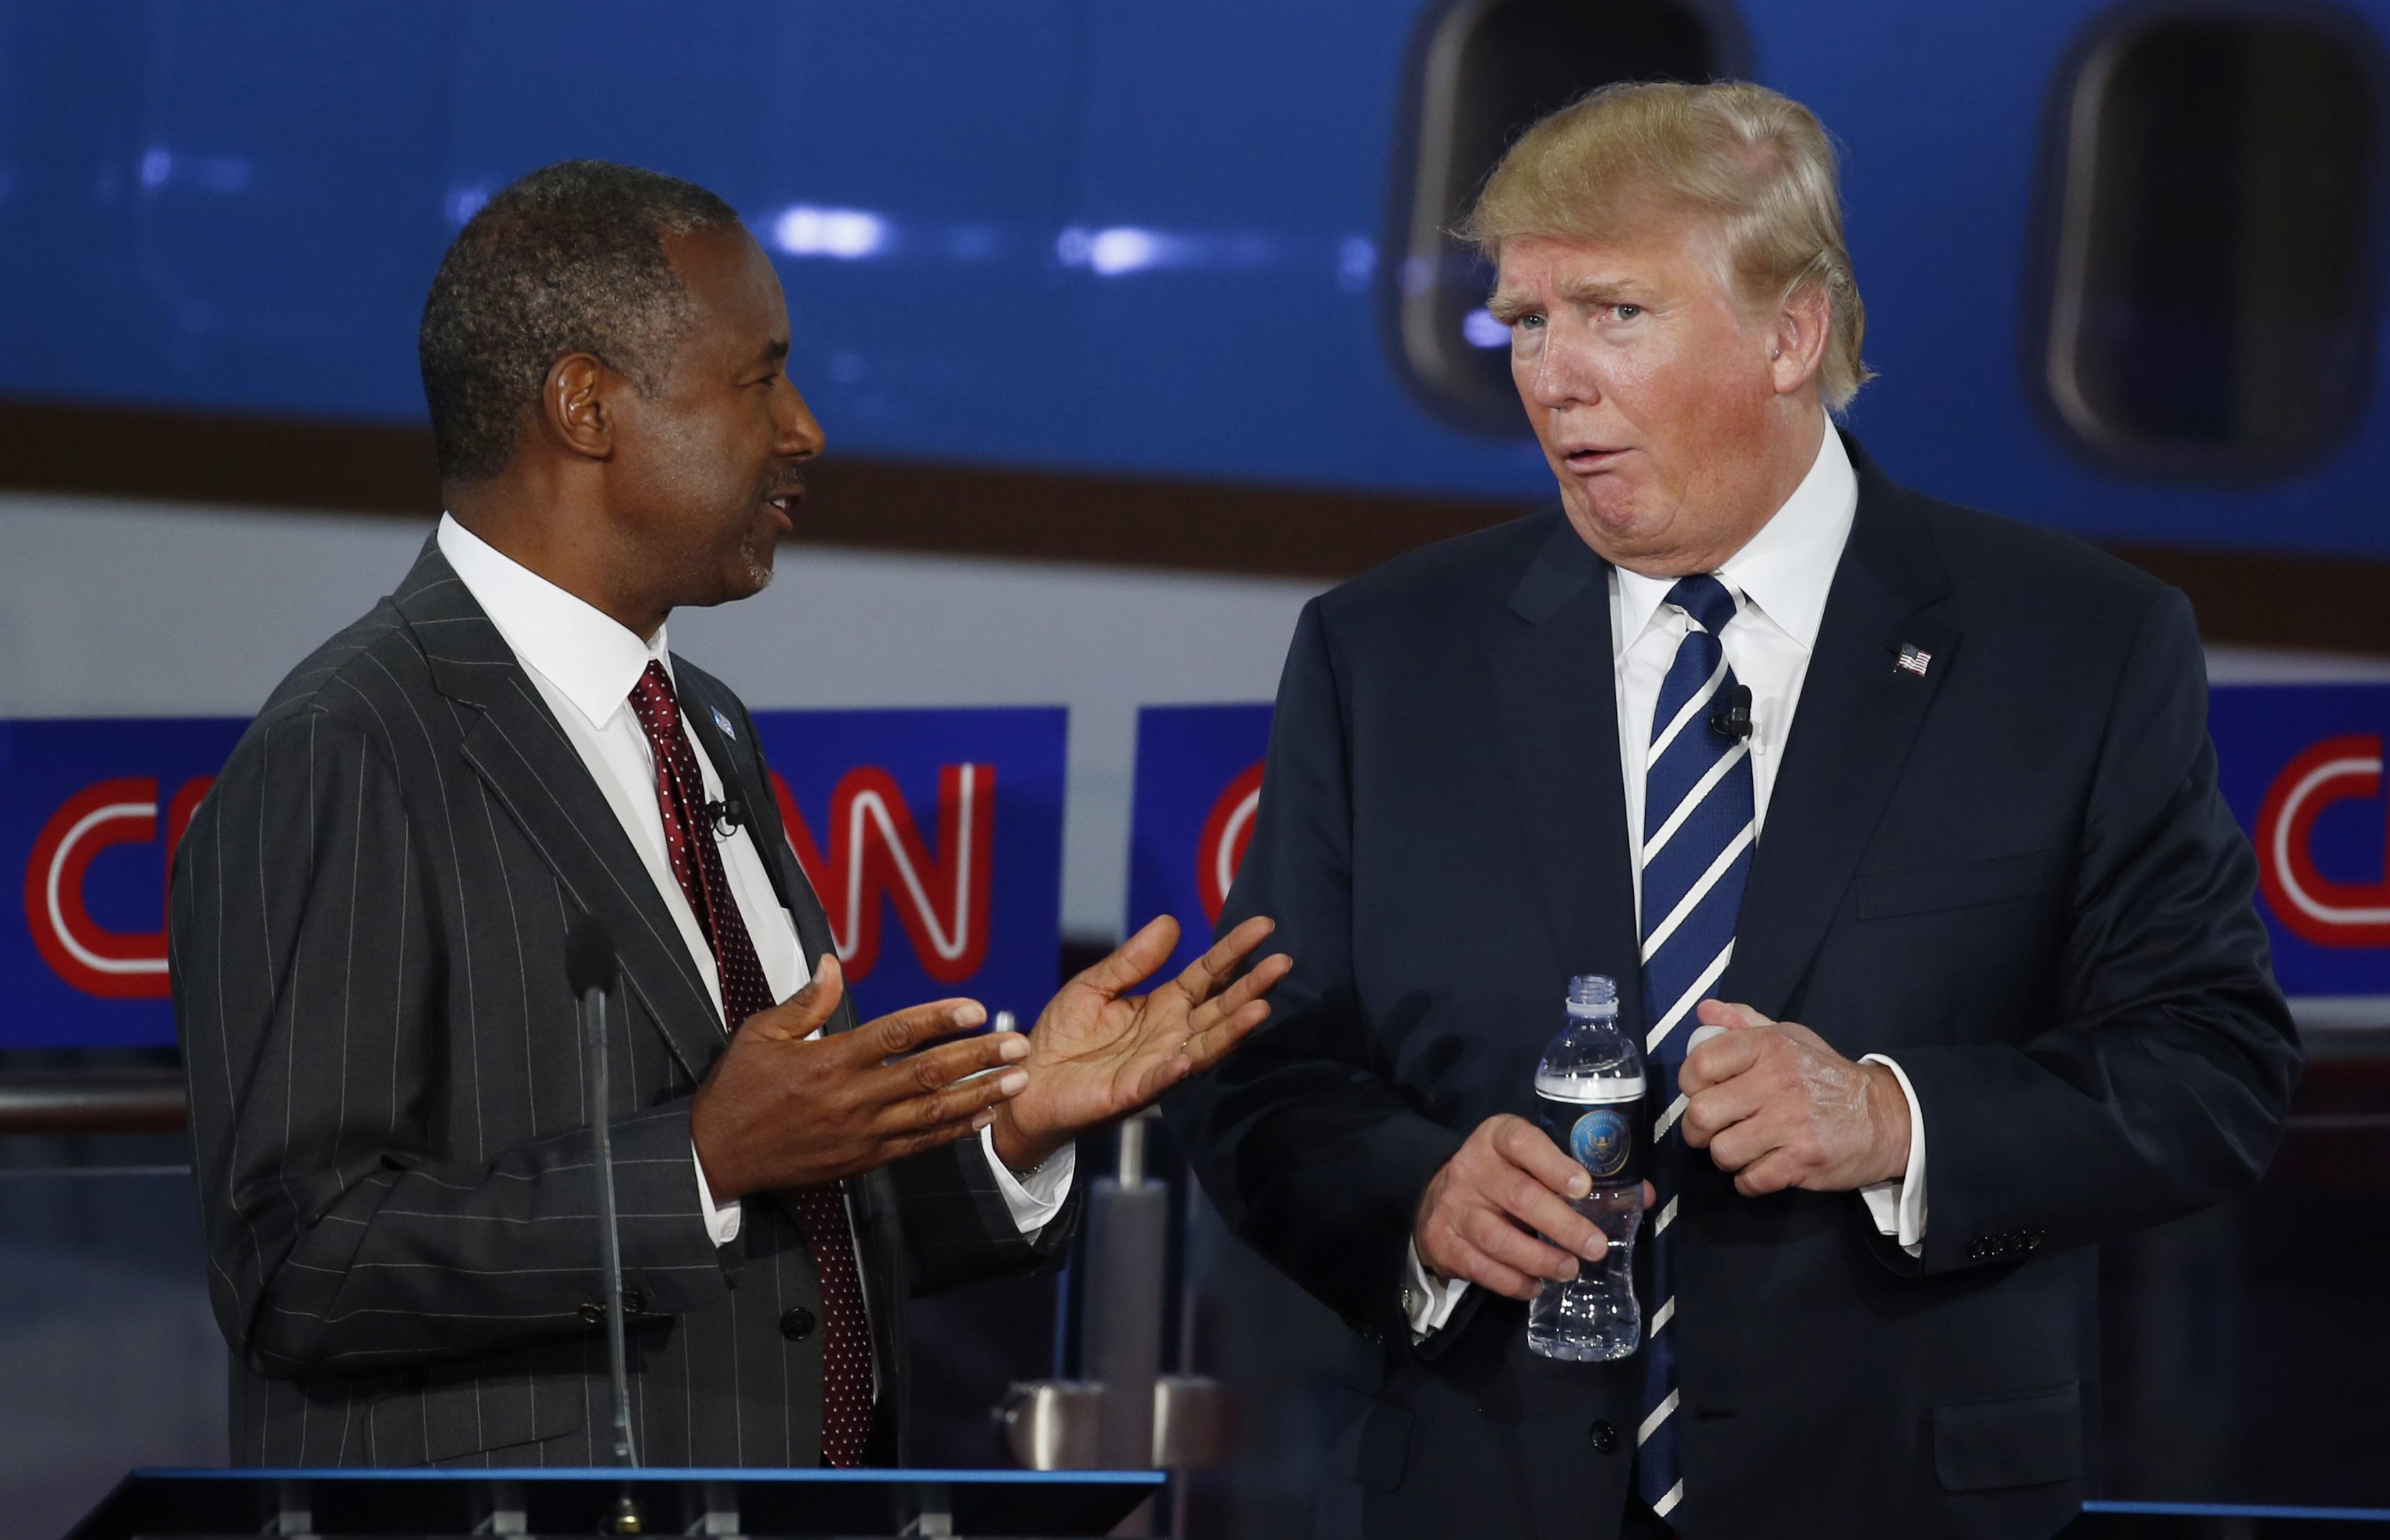 Election 2016: Donald Trump and Ben Carson threaten to